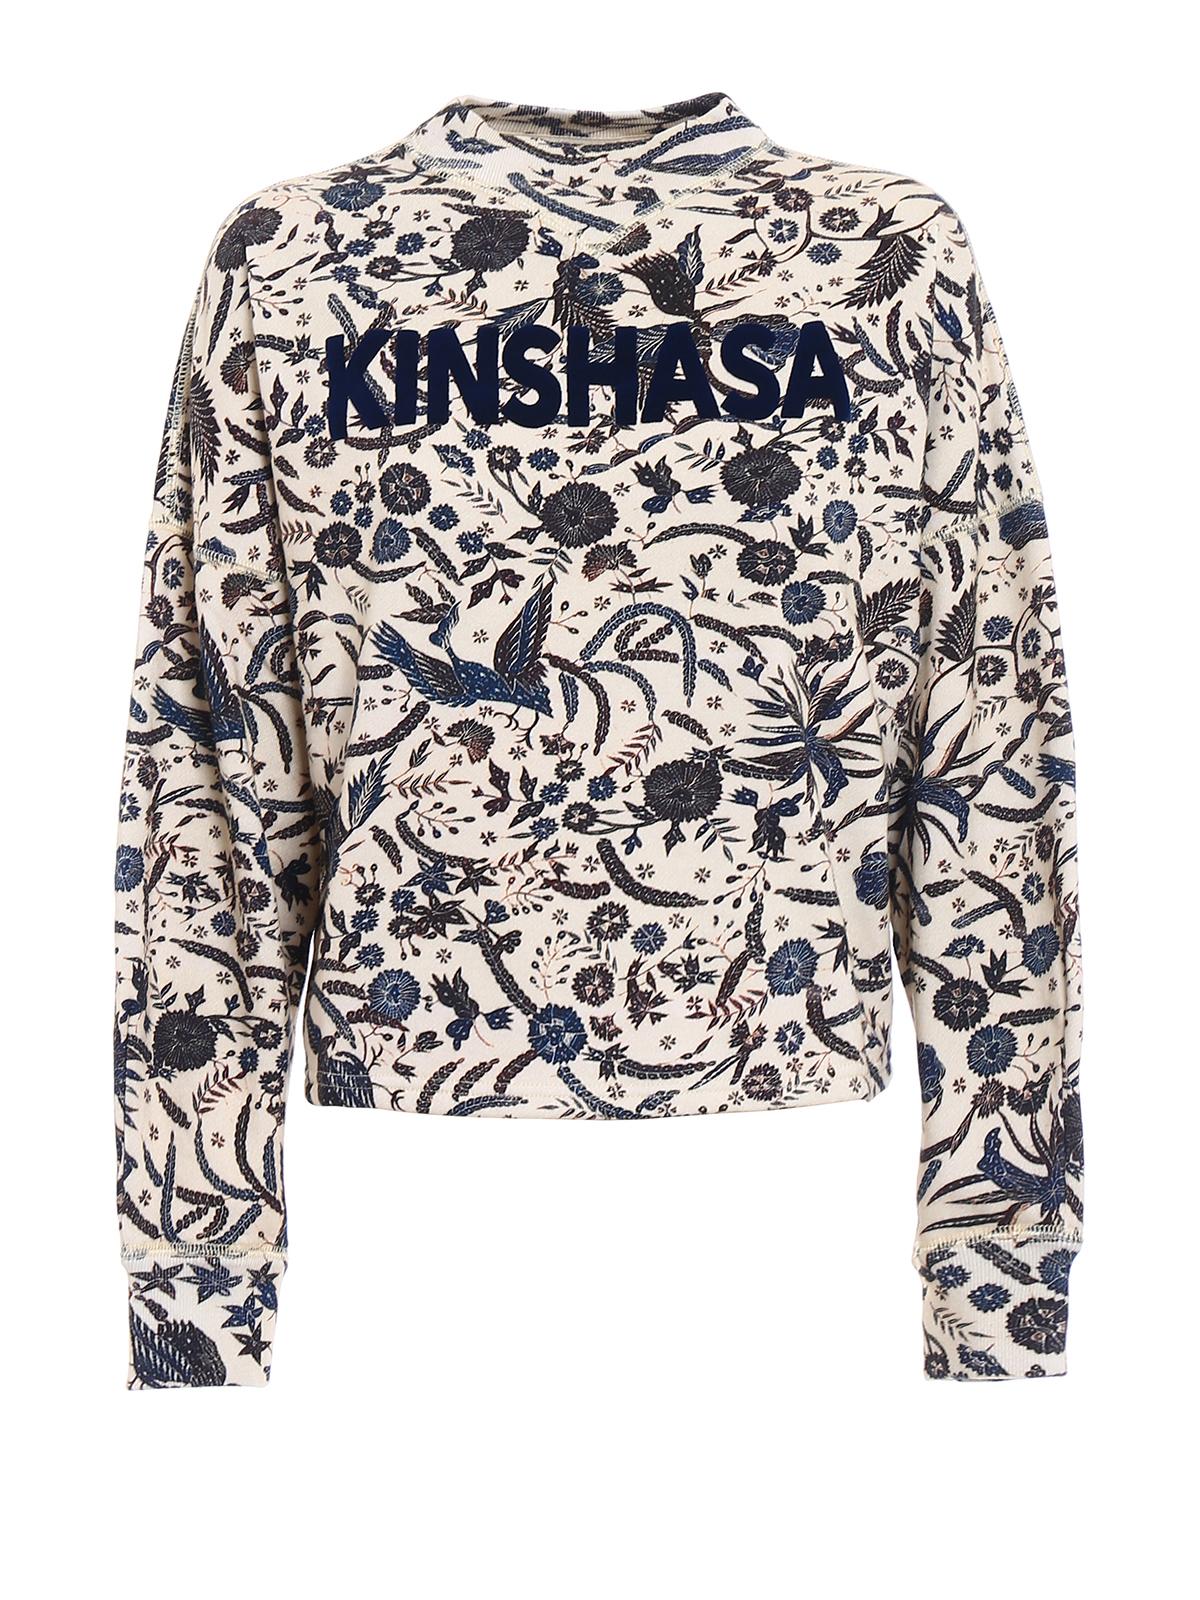 b499b8f43f4 Isabel Marant Etoile: Sweatshirts & Sweaters - Xodilon beige boxy sweatshirt